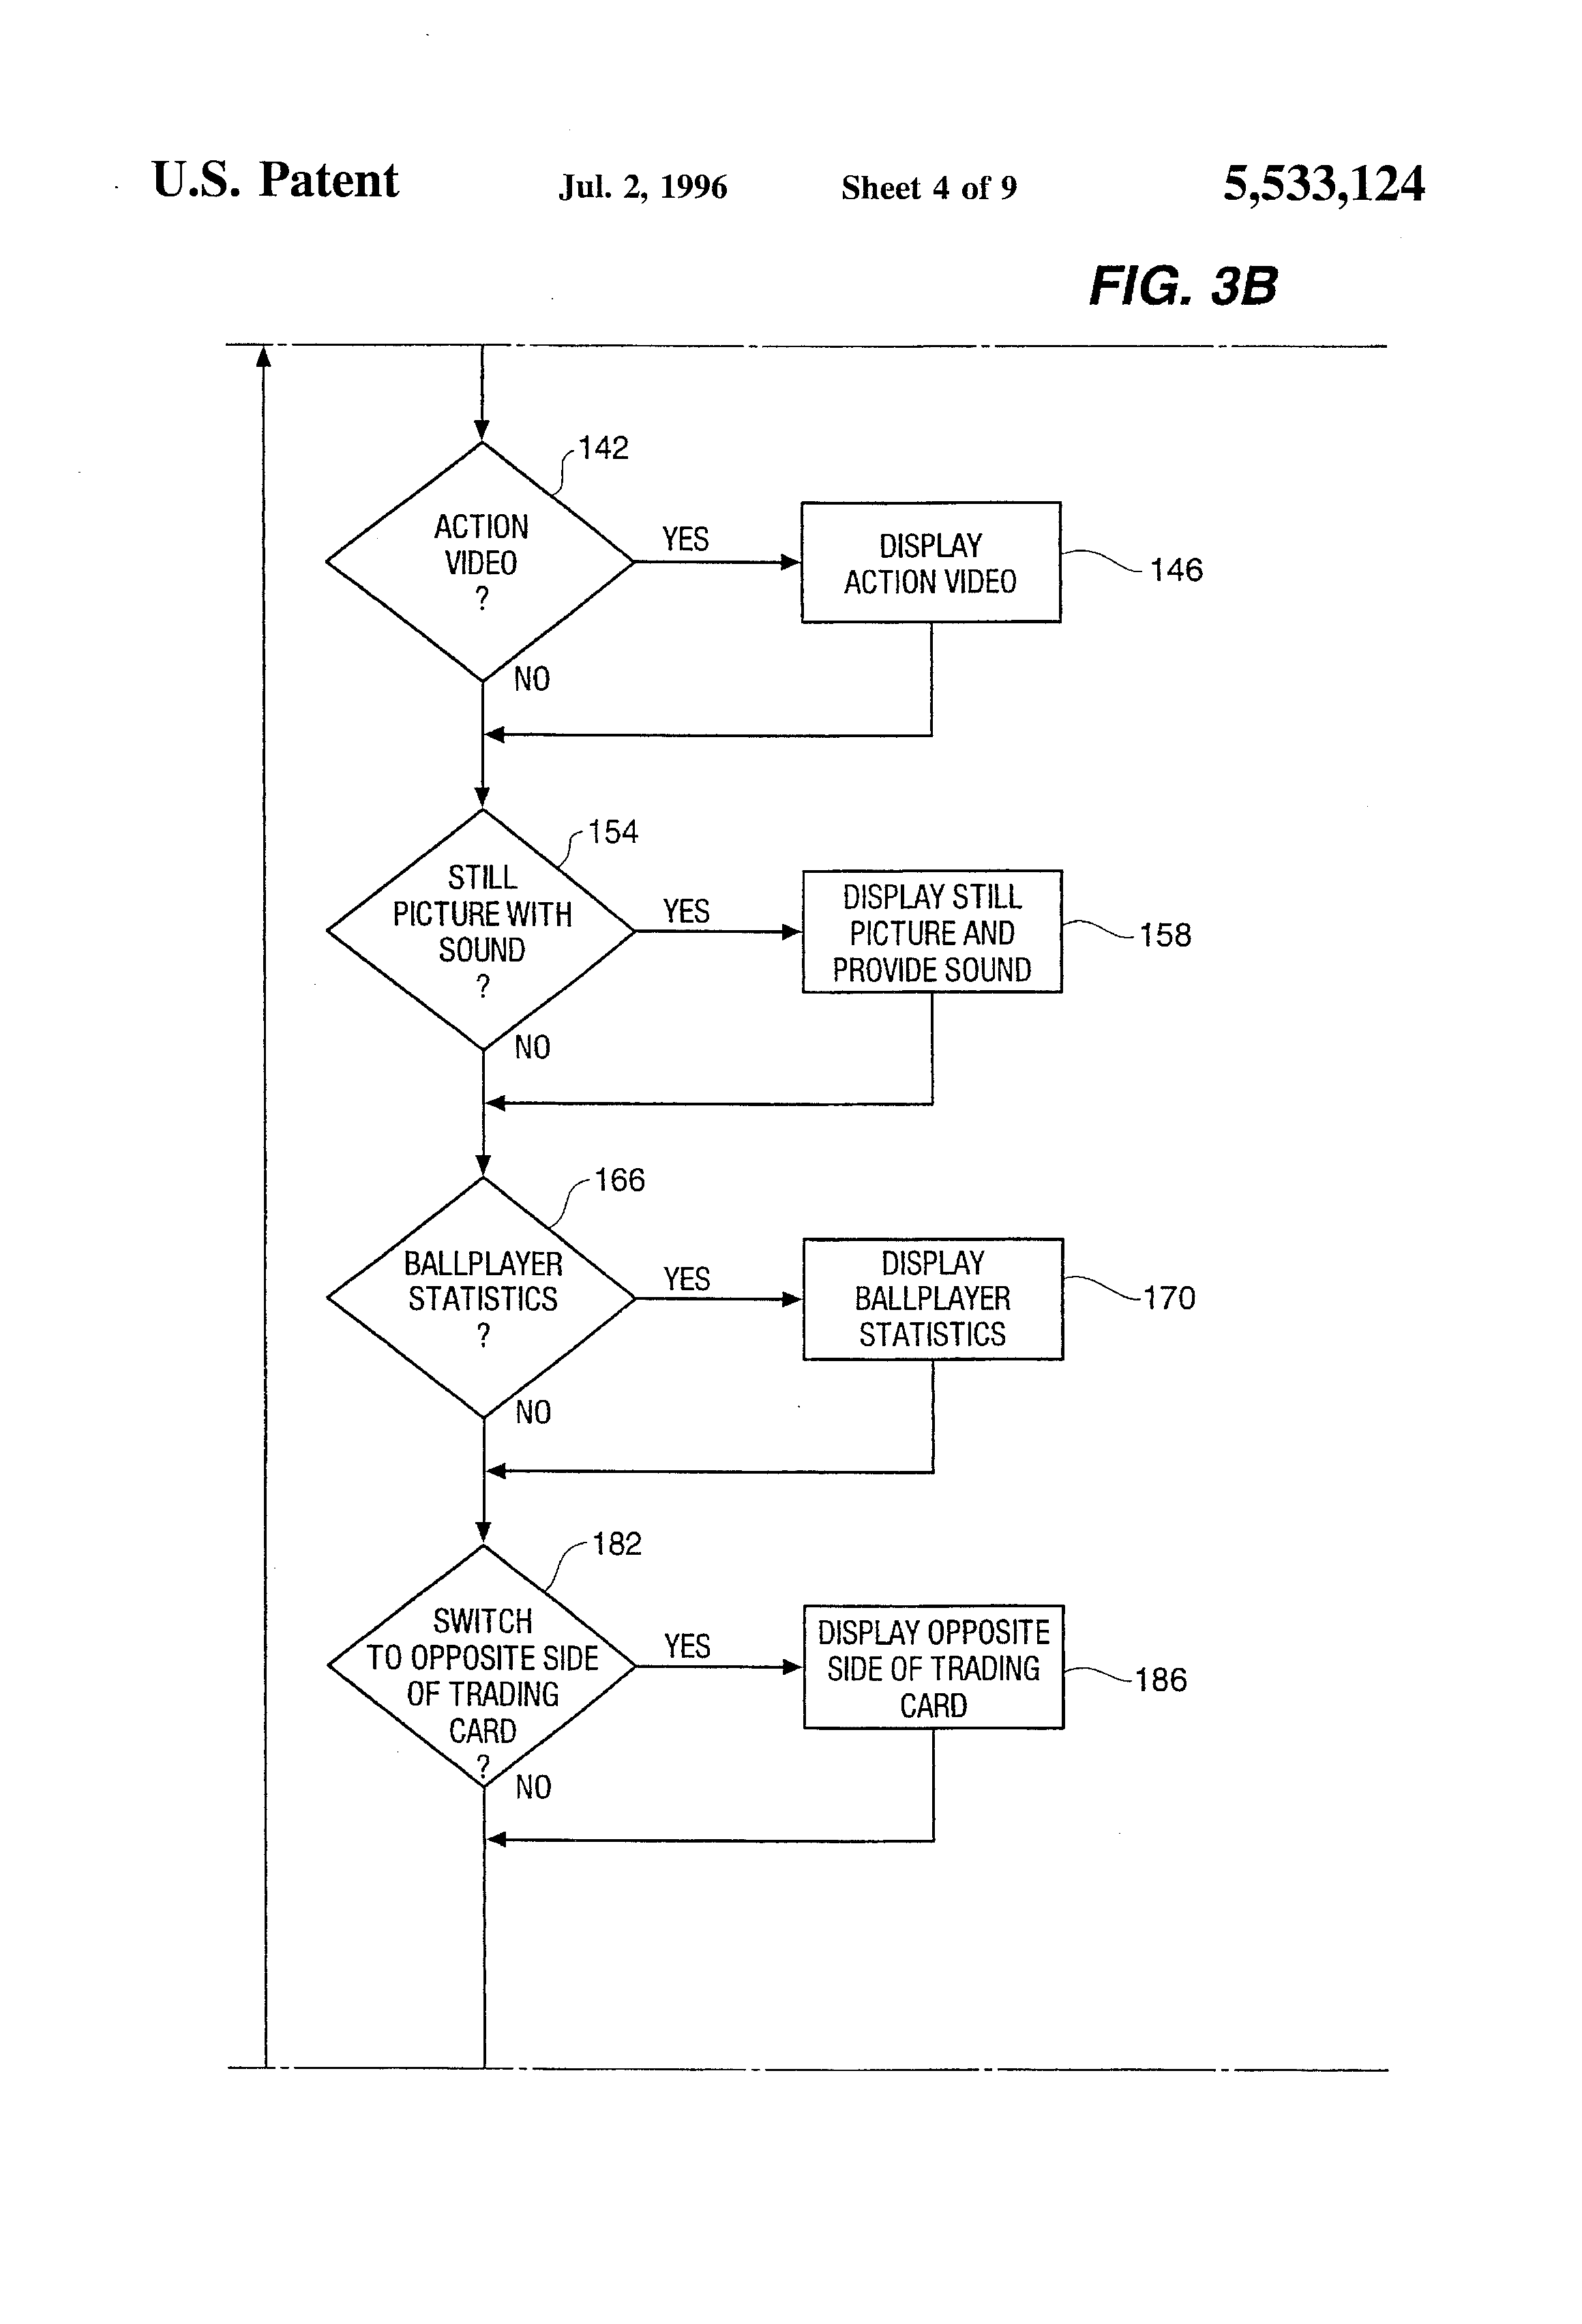 Trading card storage system